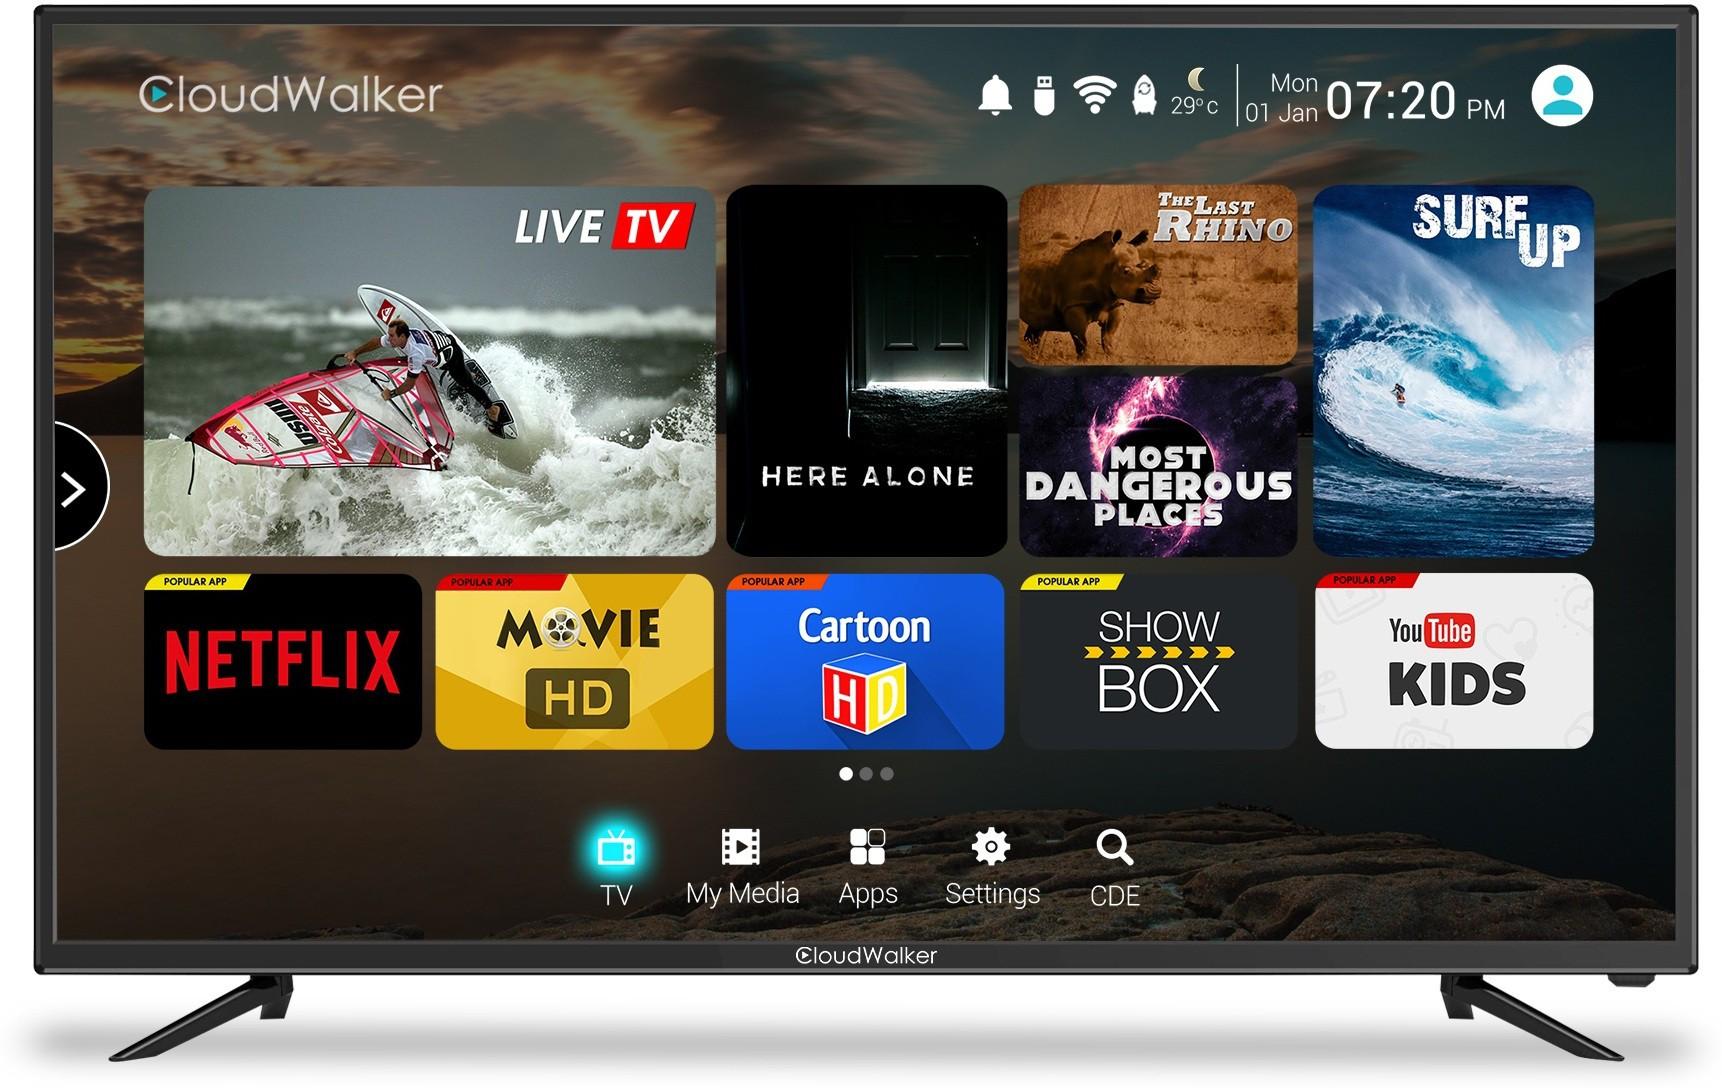 CLOUDWALKER 43SF 43 Inches Full HD LED TV